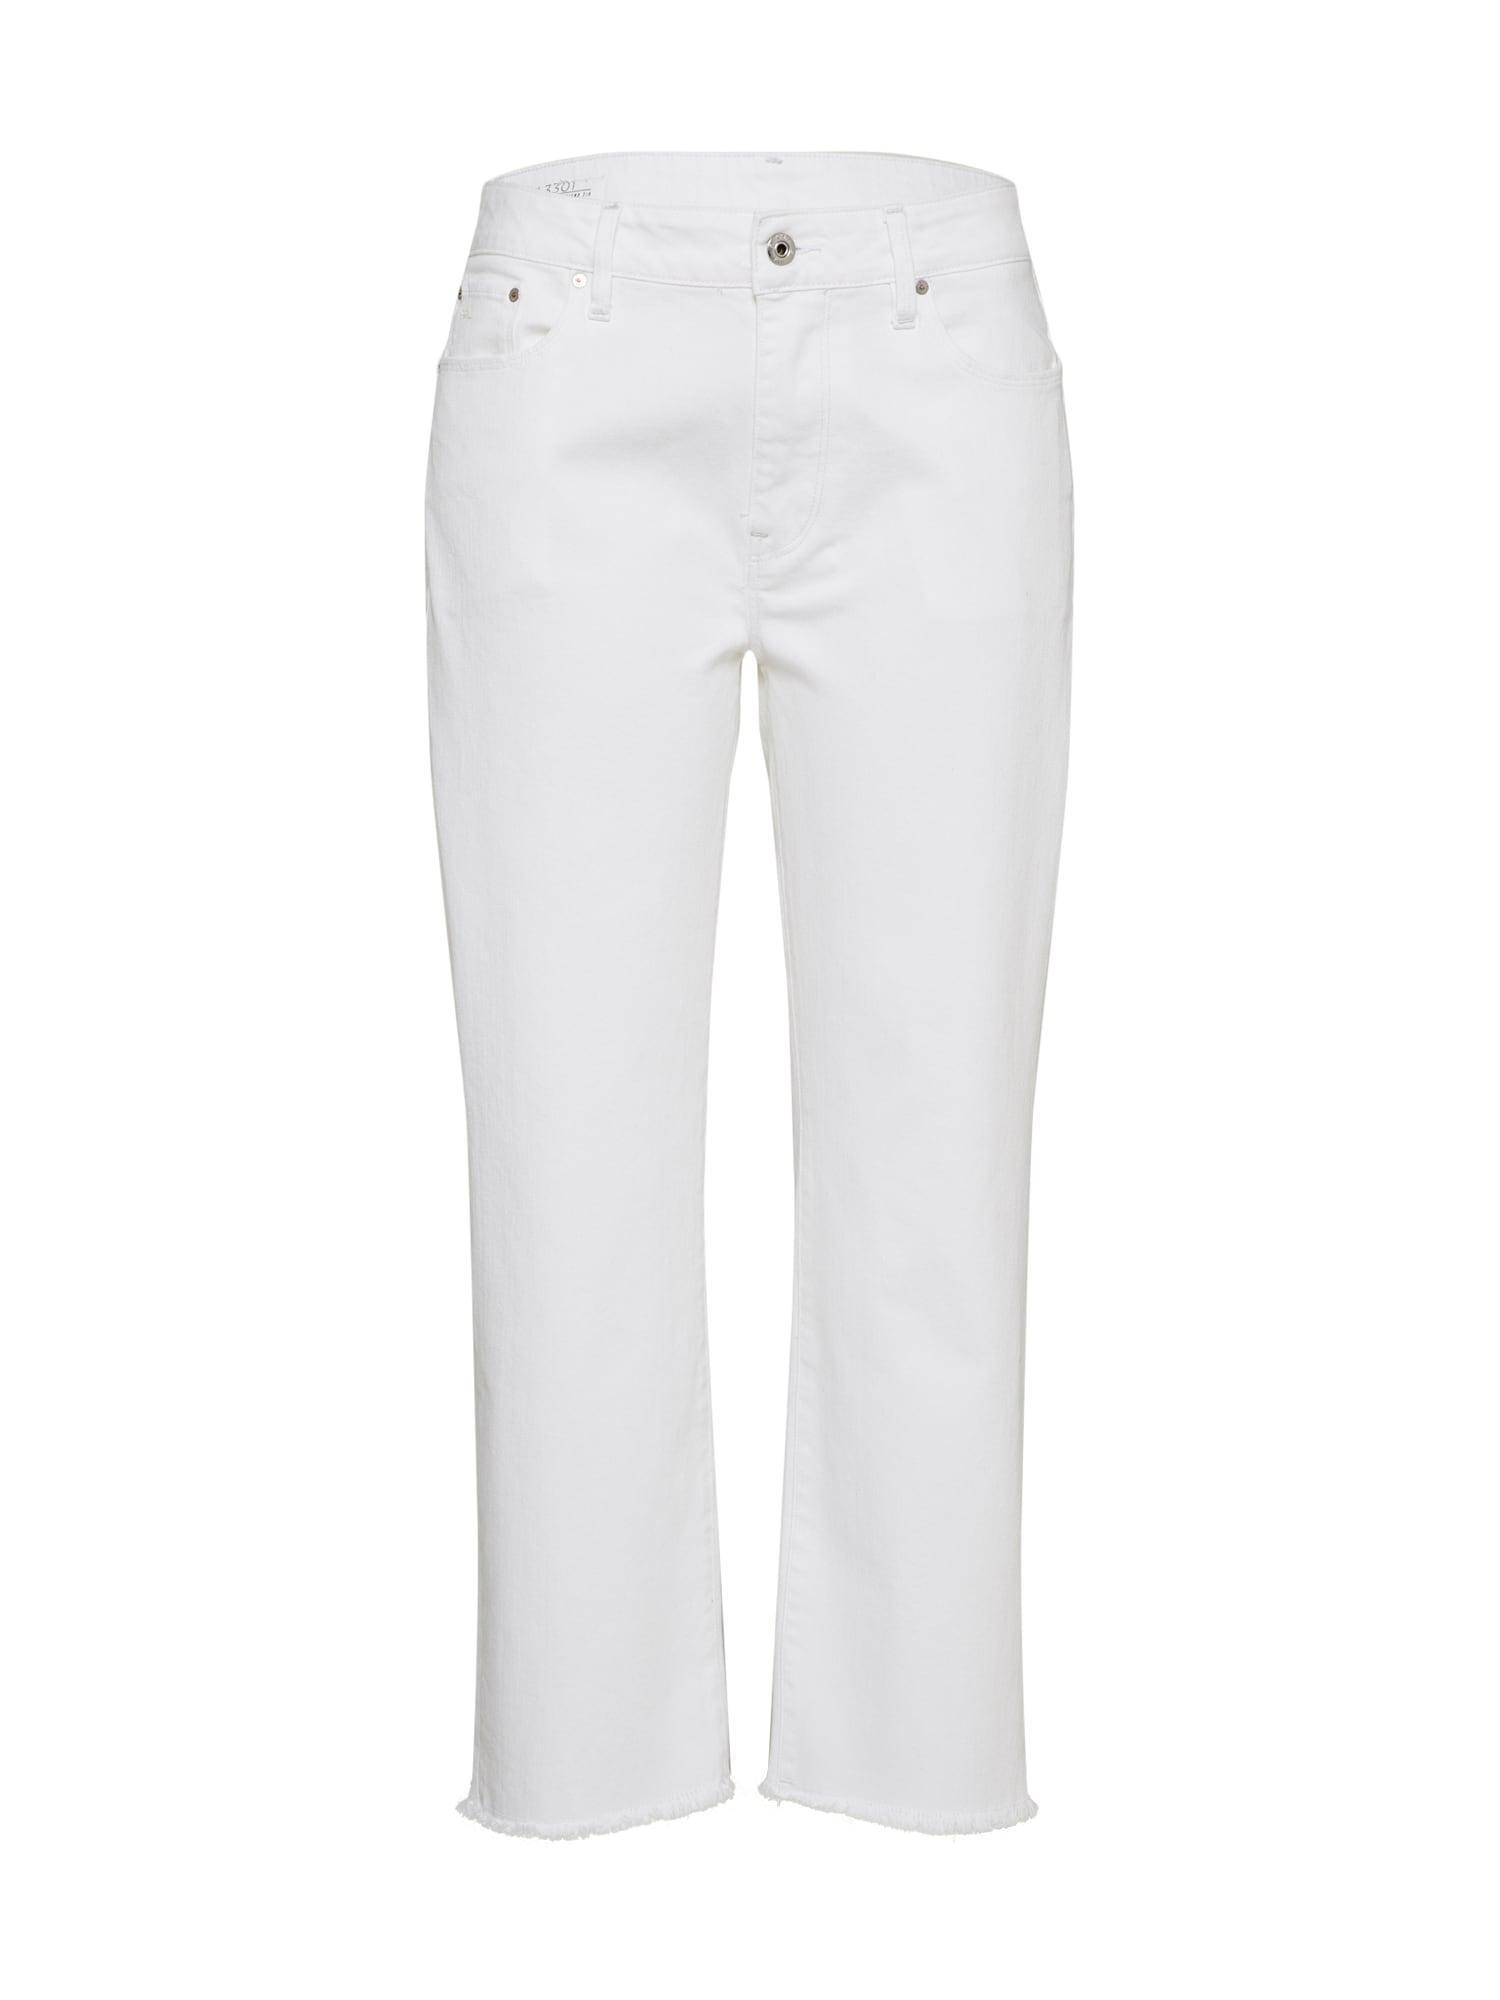 G-STAR RAW Dames Jeans white denim